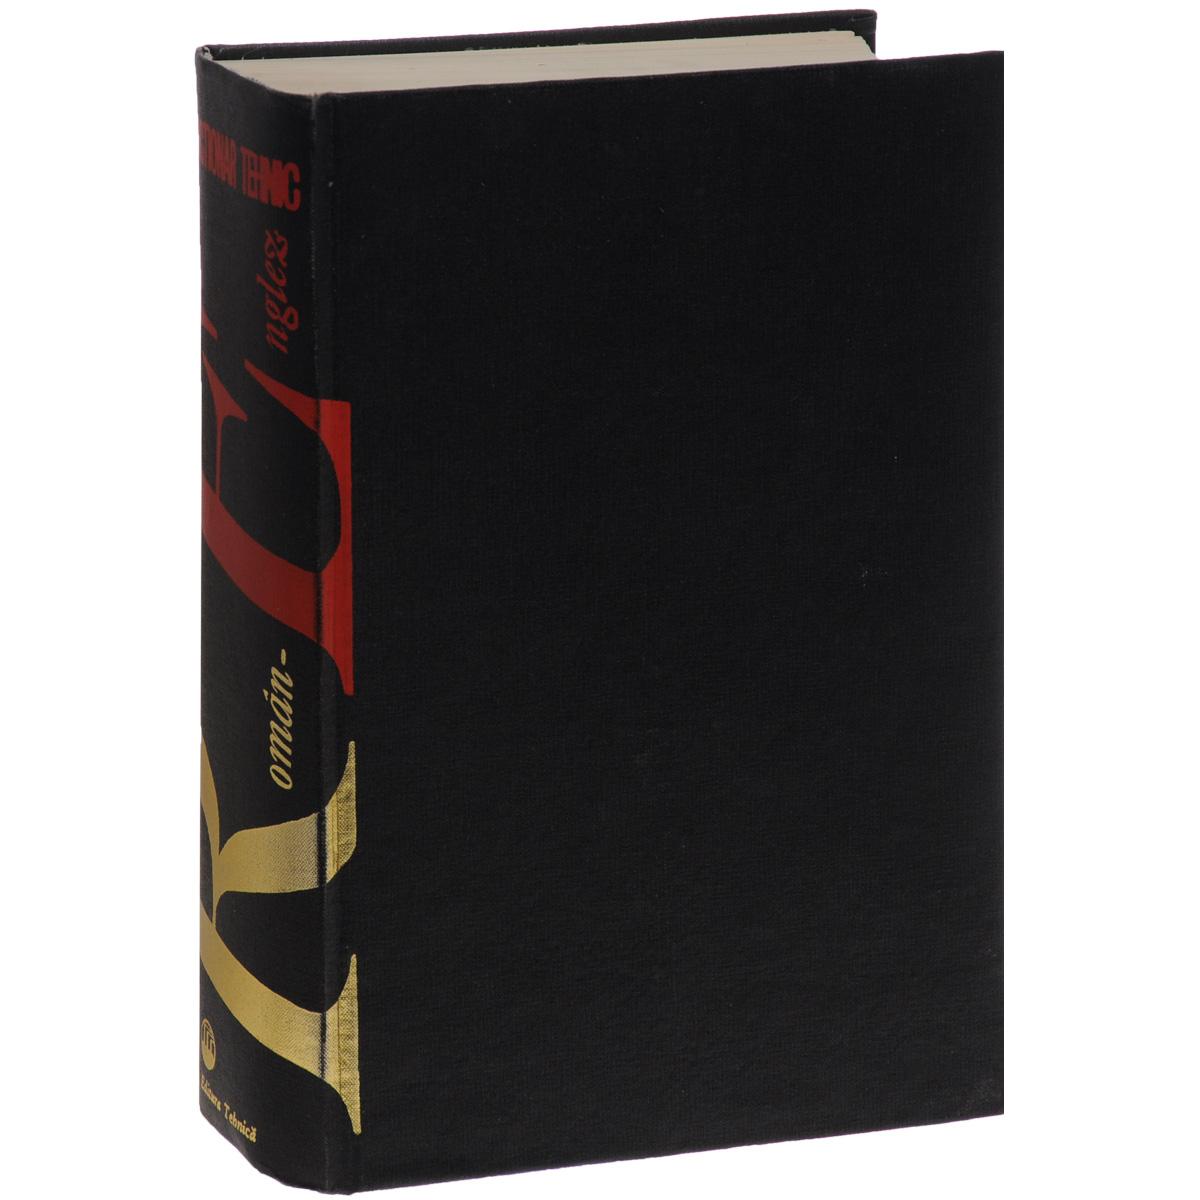 Dictionar Tehnic Roman-Englez.